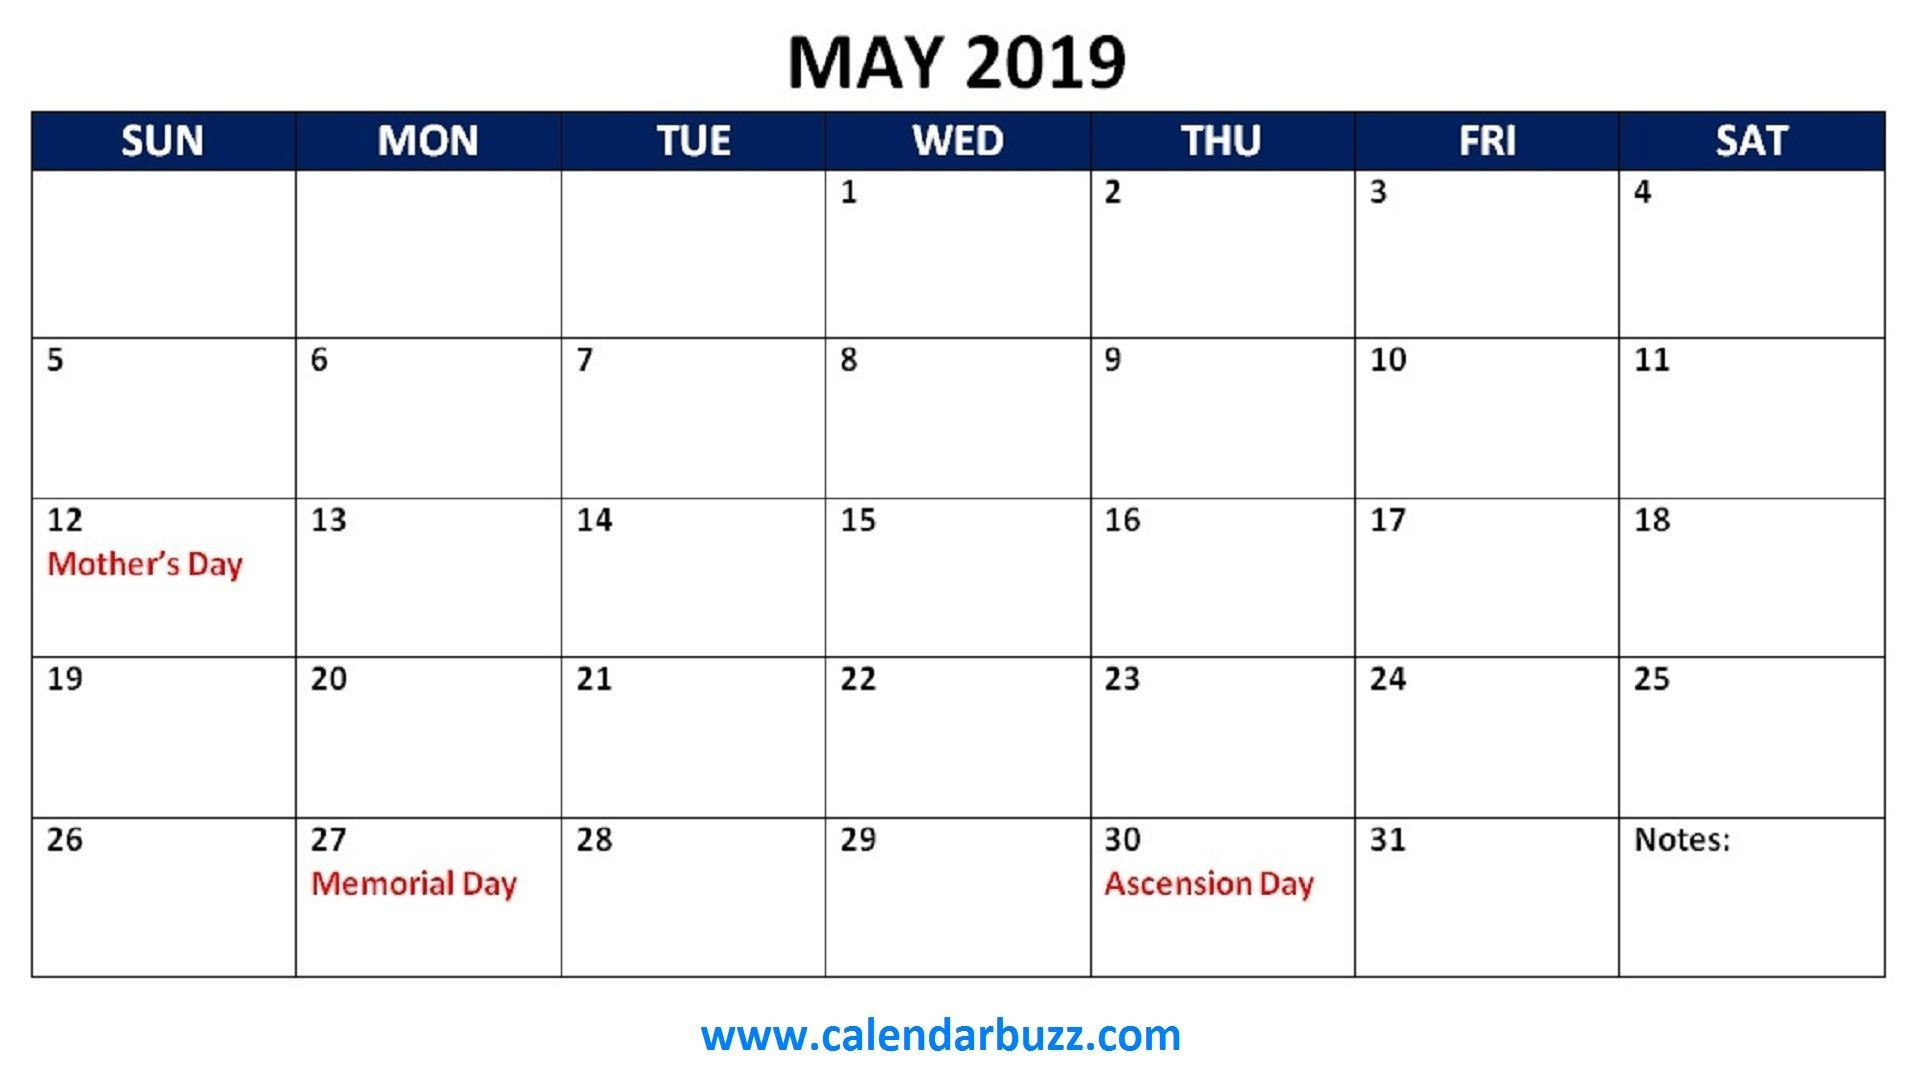 Calendario 2019 Mensual Imprimir Más Actual Calendario Festivos Colombia 2019 Takvim Kalender Hd